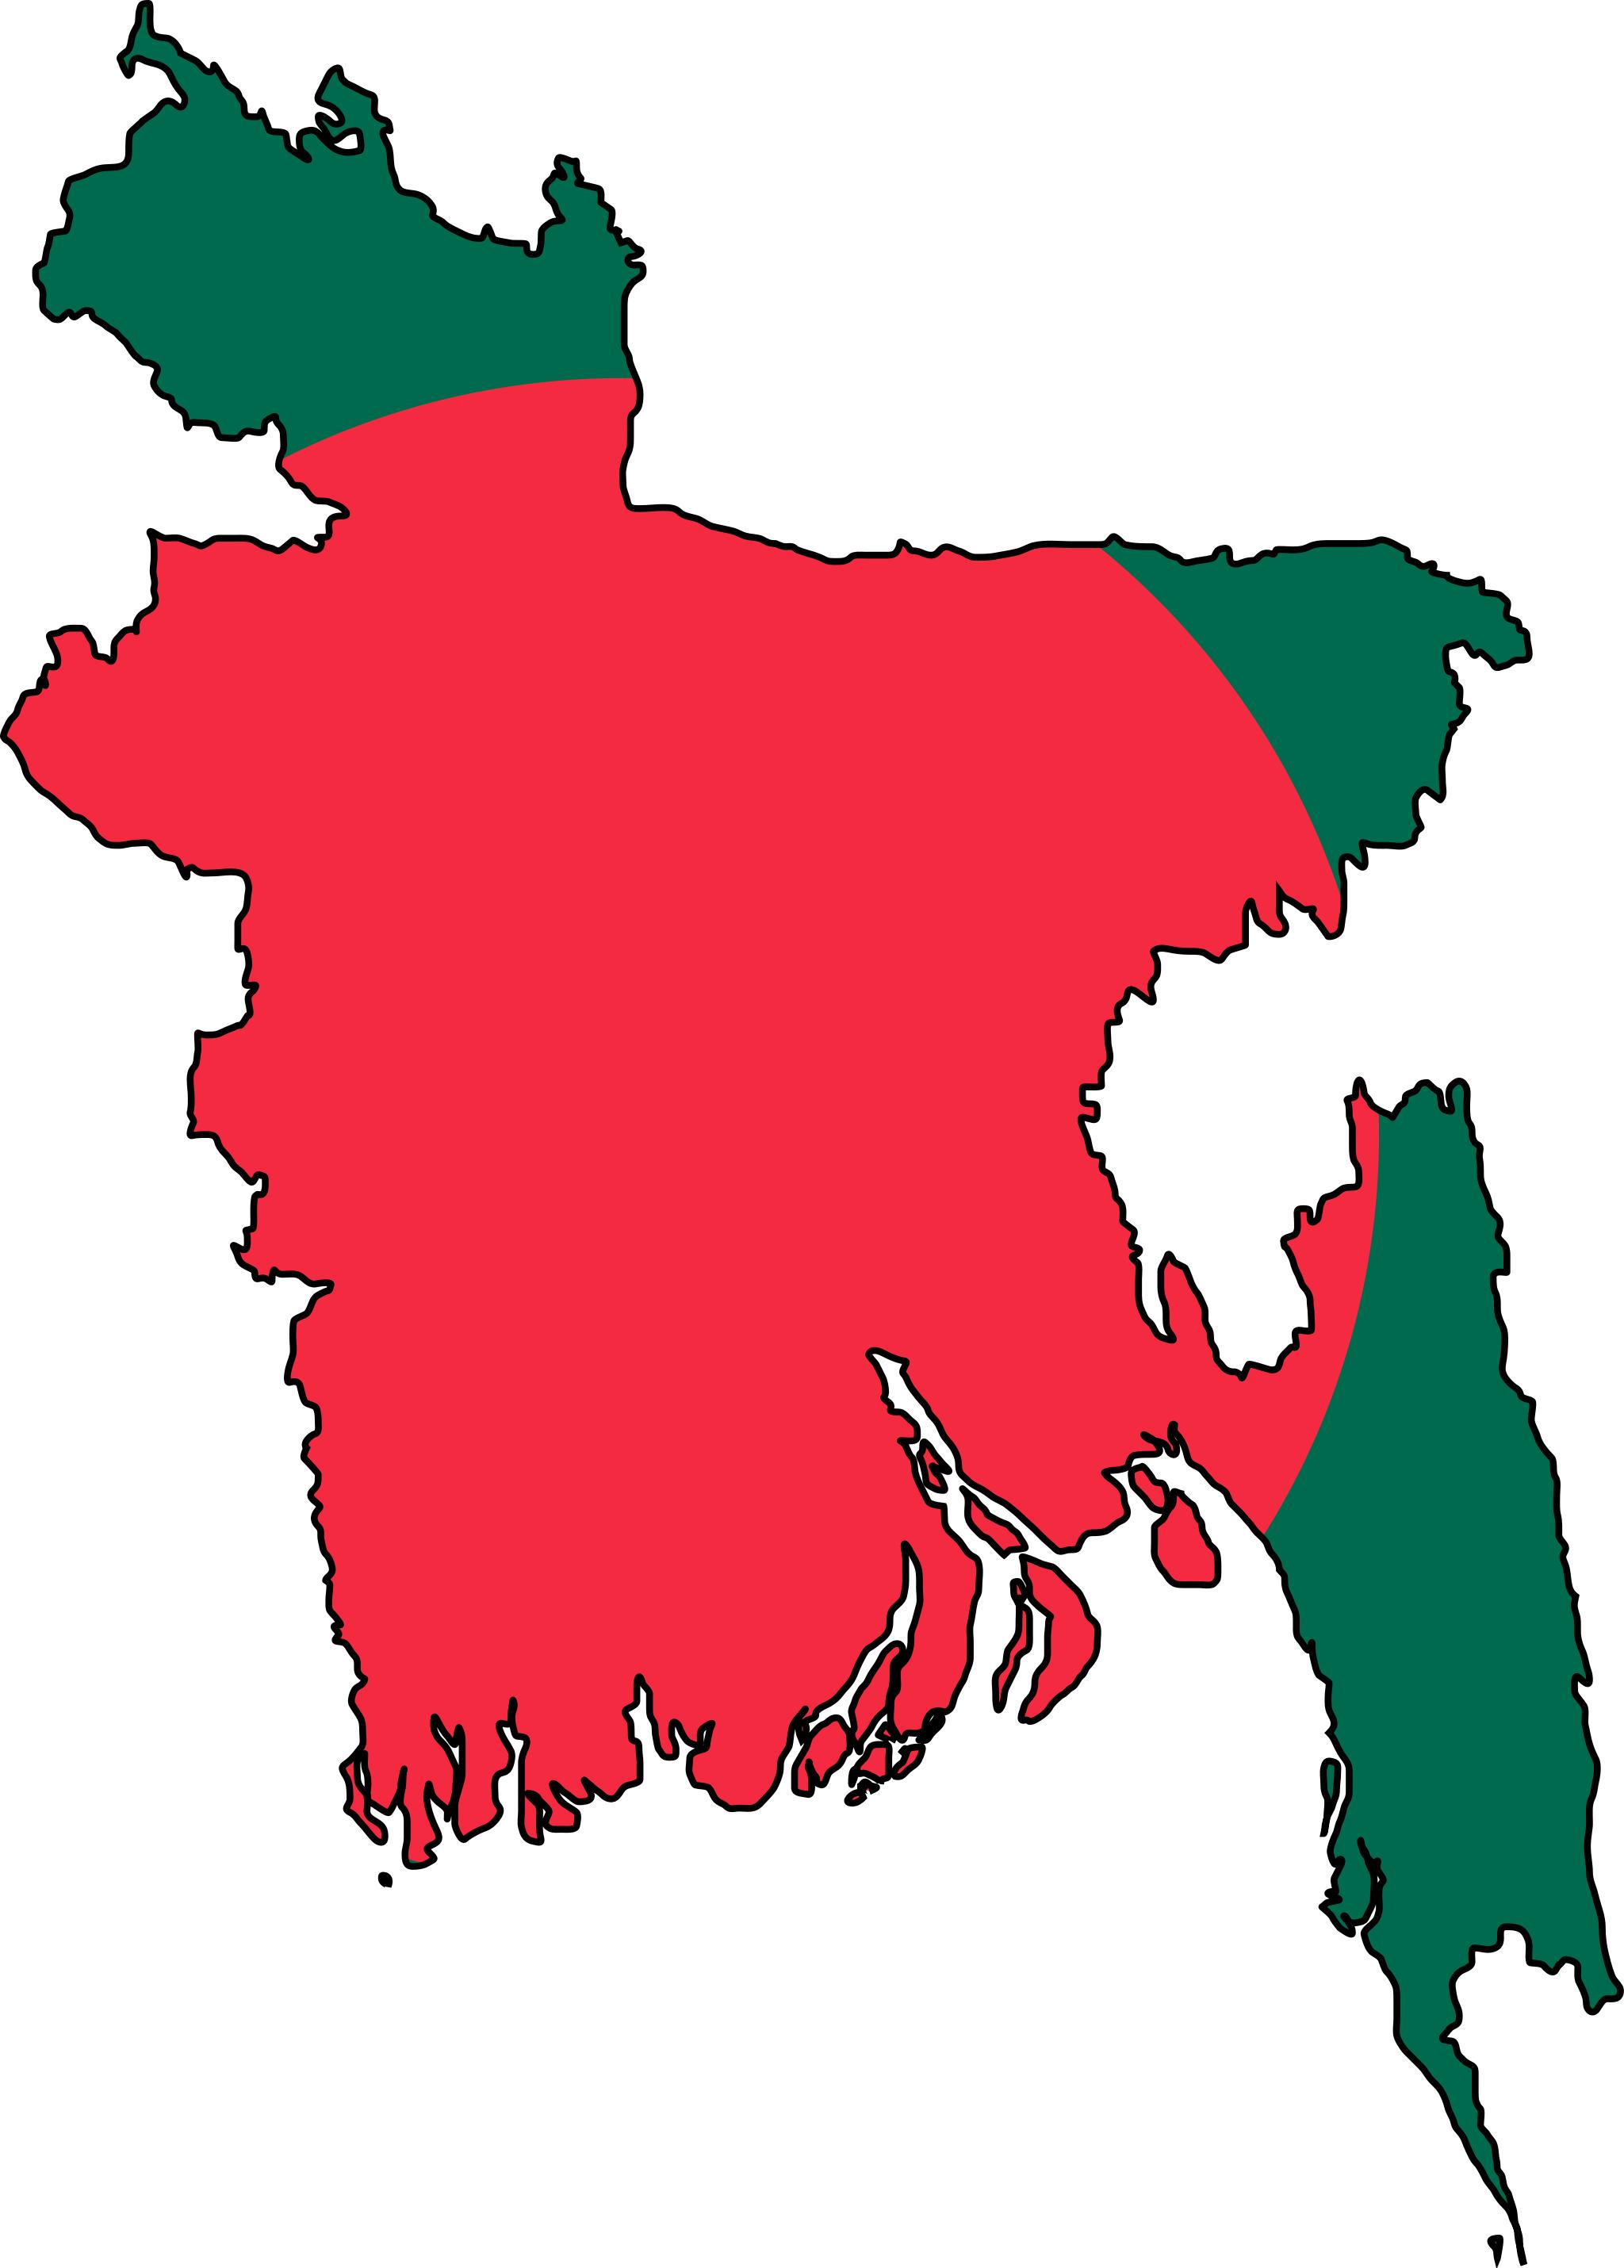 Pin by Surjevon Dhillon on Bangladesh in 2019 | Bangladesh flag ...